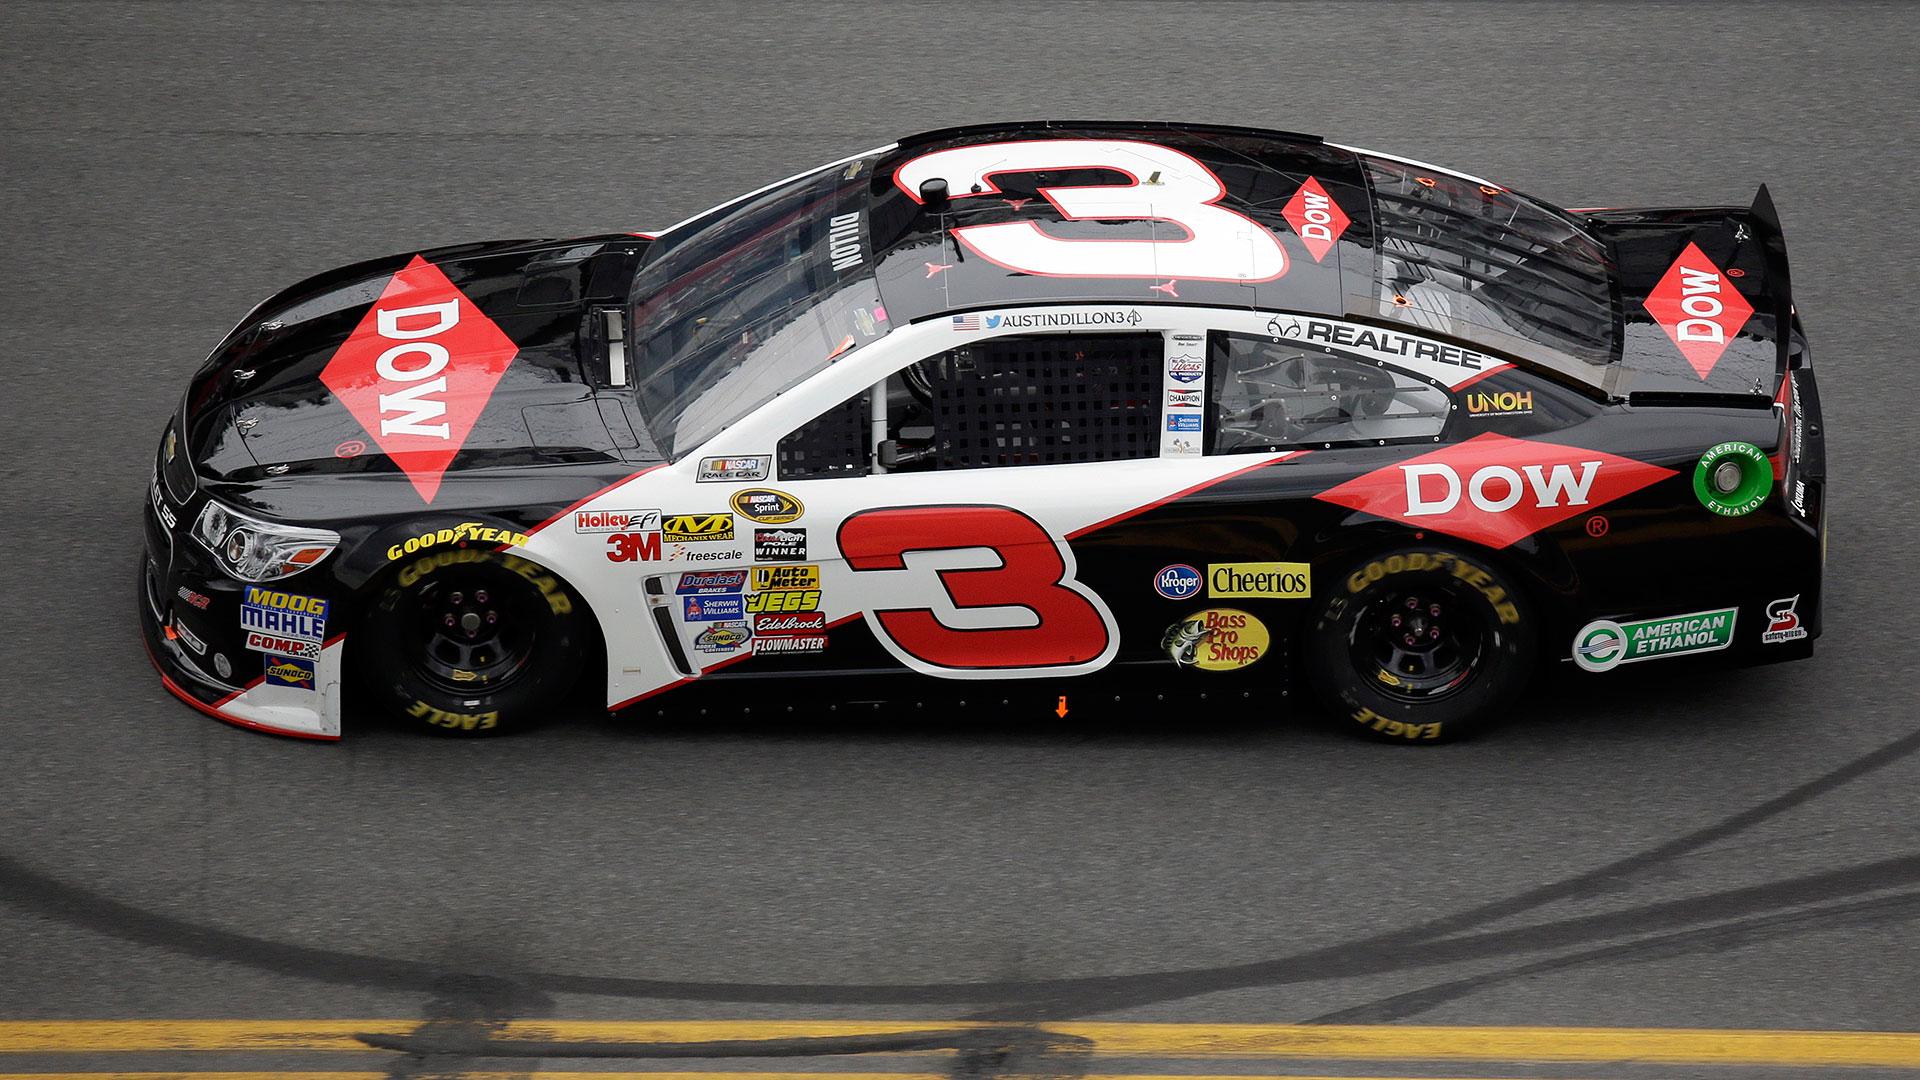 NASCAR-Dillon2-040114-AP-FTR